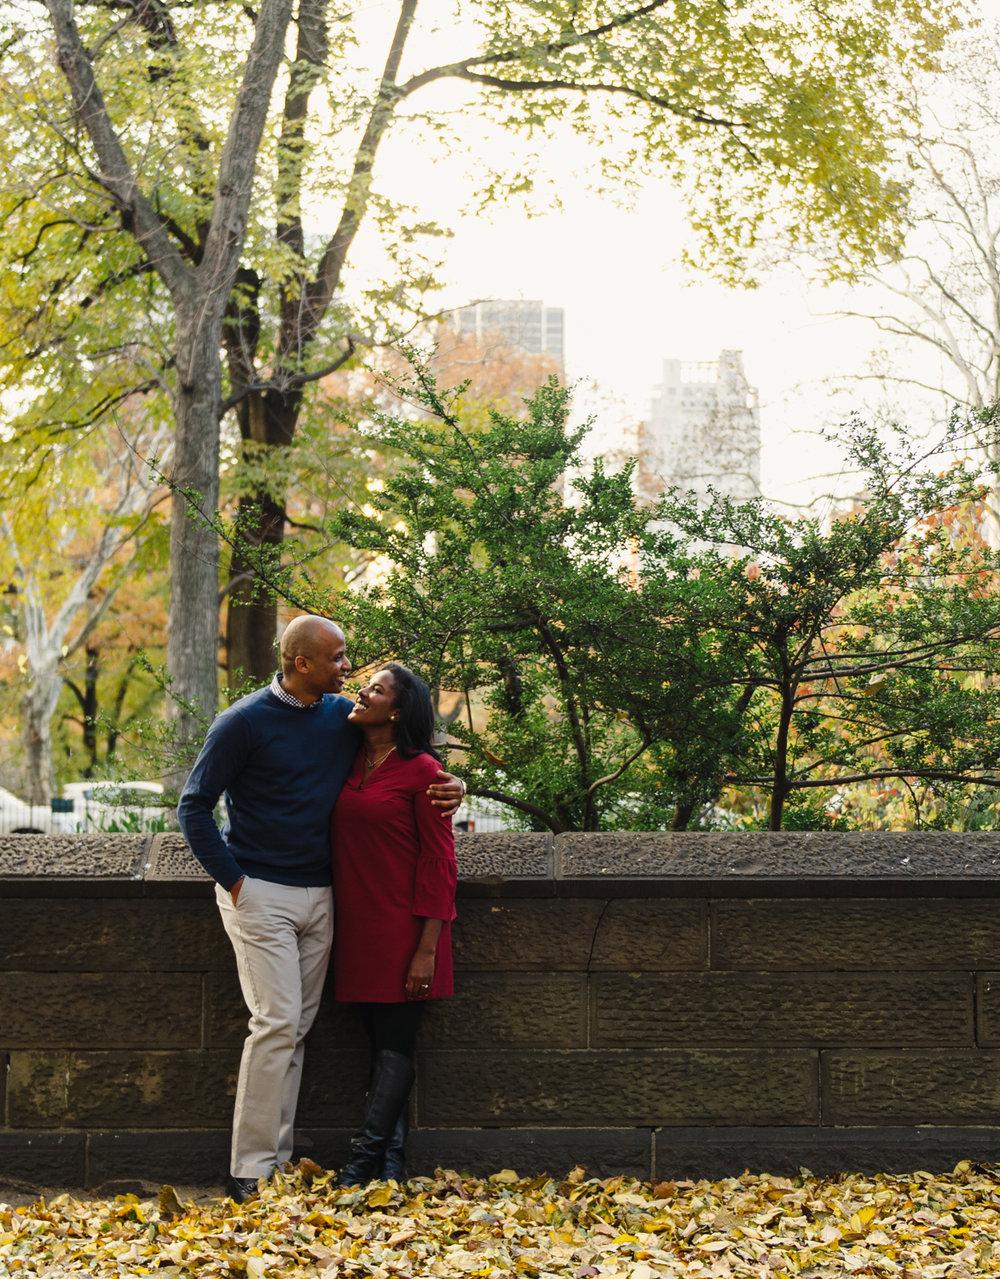 CentralPark.Manhattan.NYC.PlazaHotel.EngagementPhotos.3.jpg